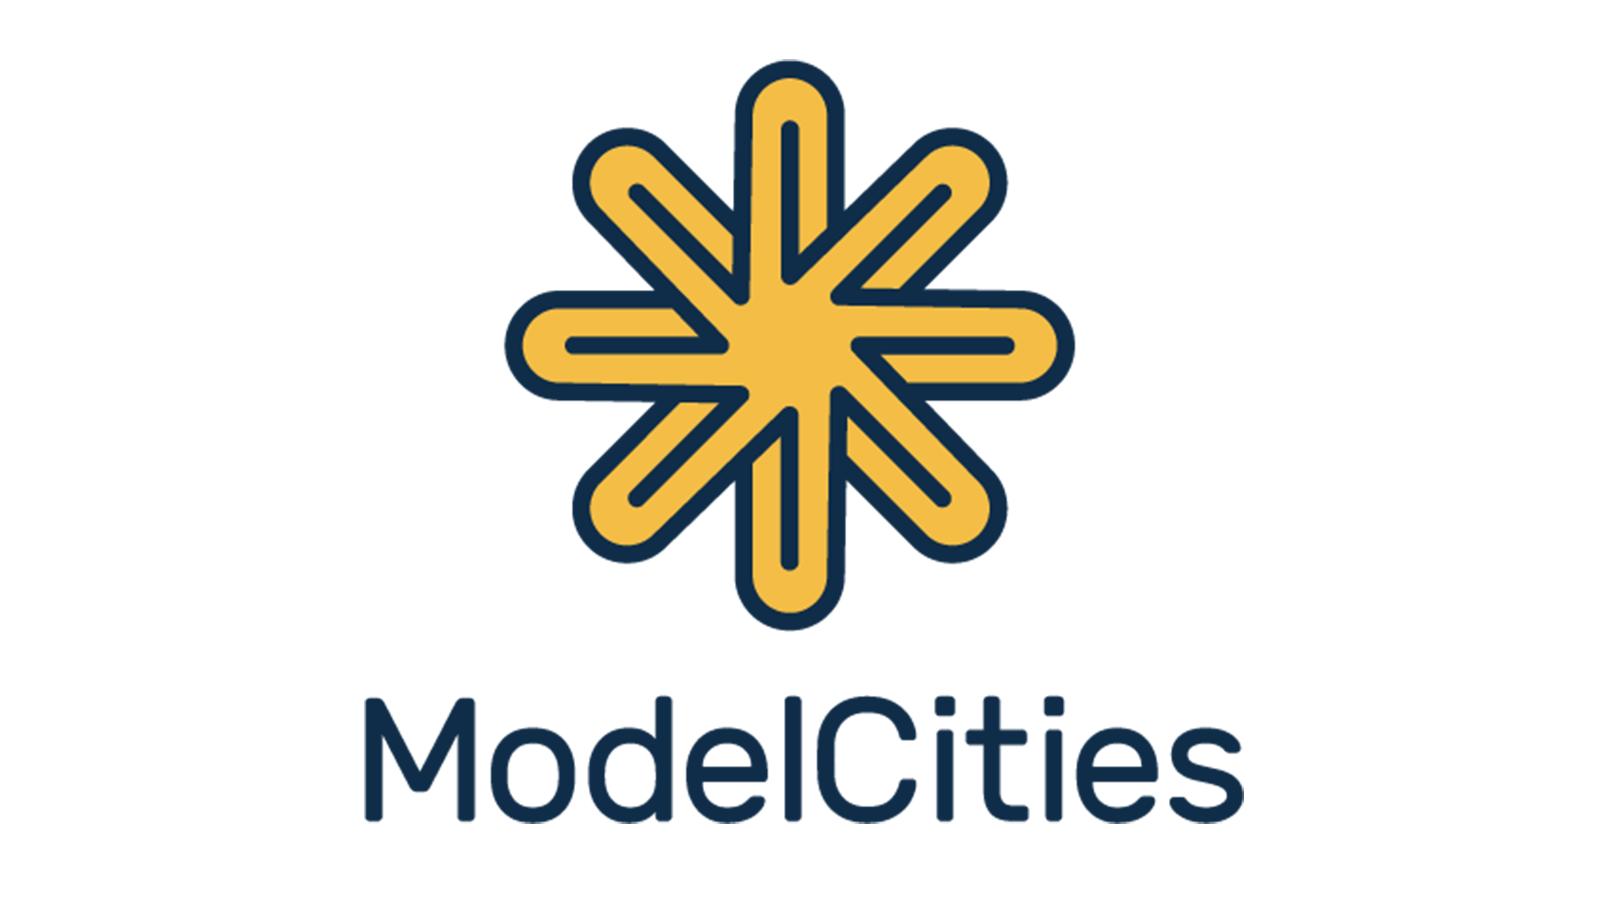 ModelCities